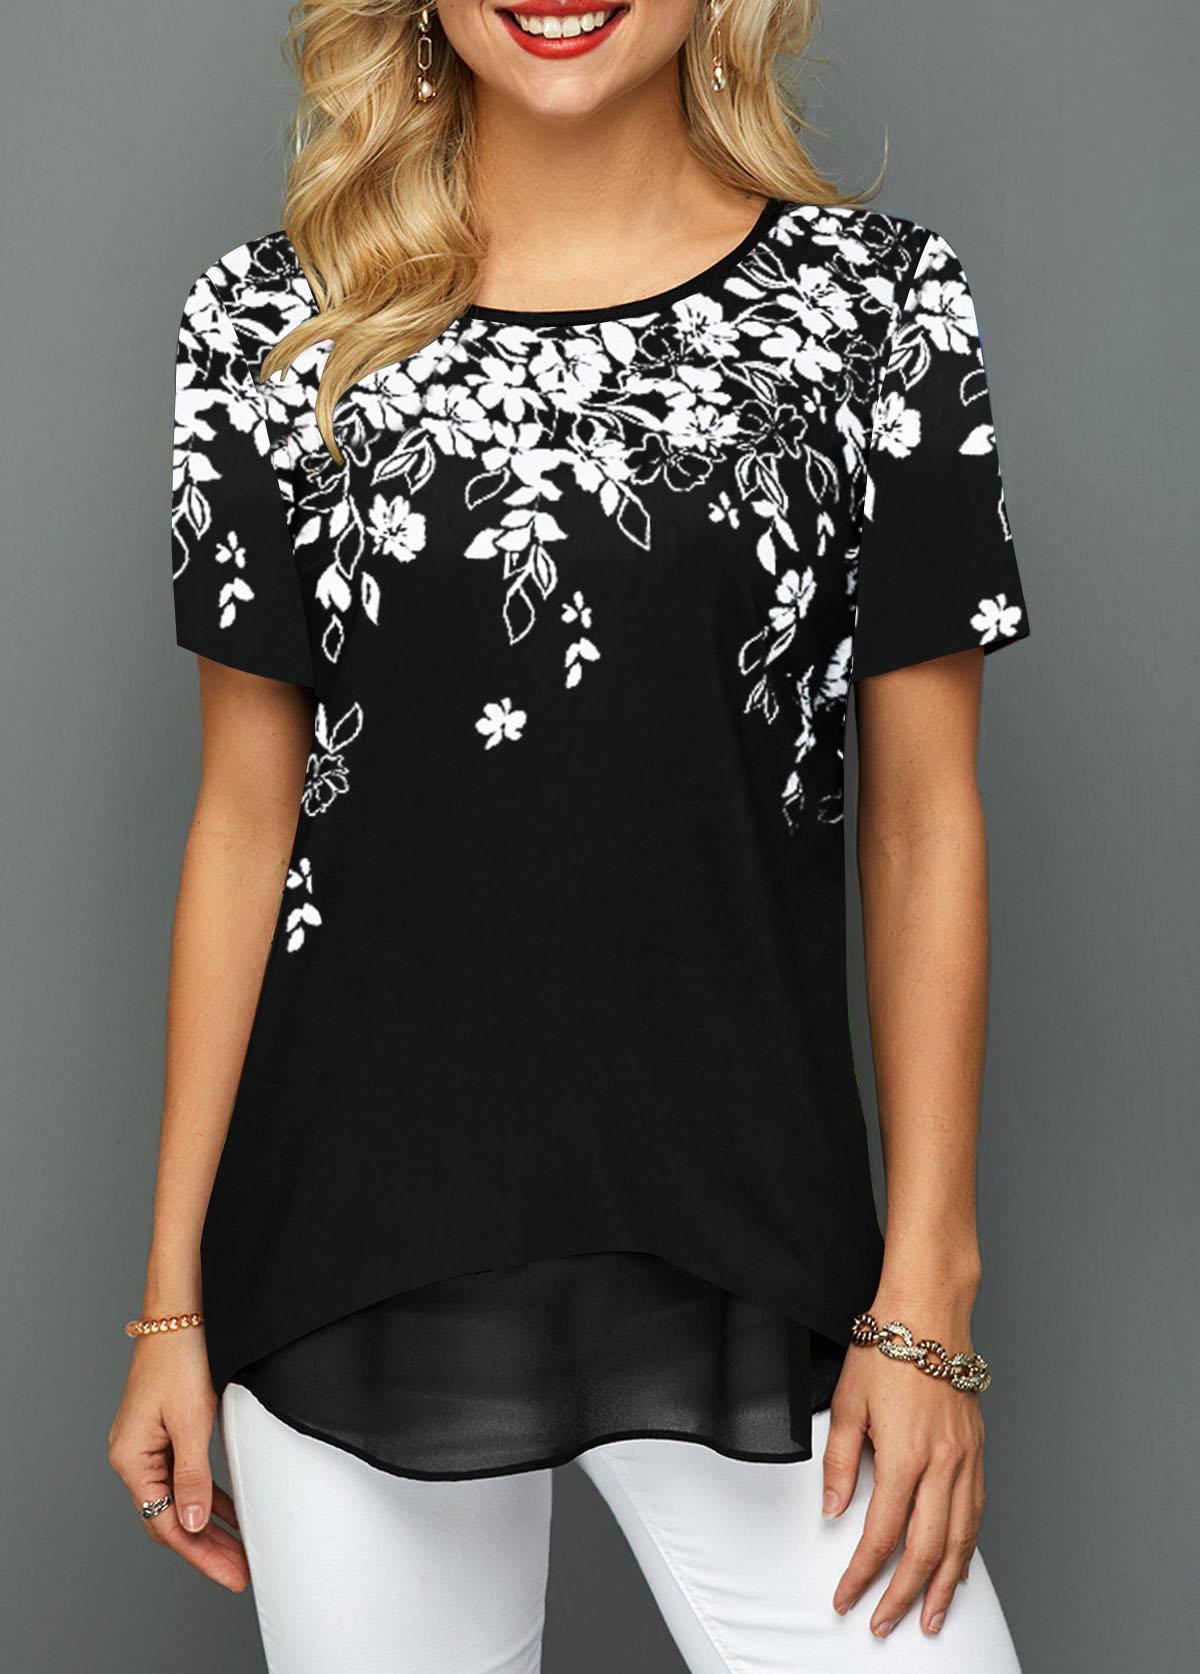 Floral Print Short Sleeve Round Neck T Shirt